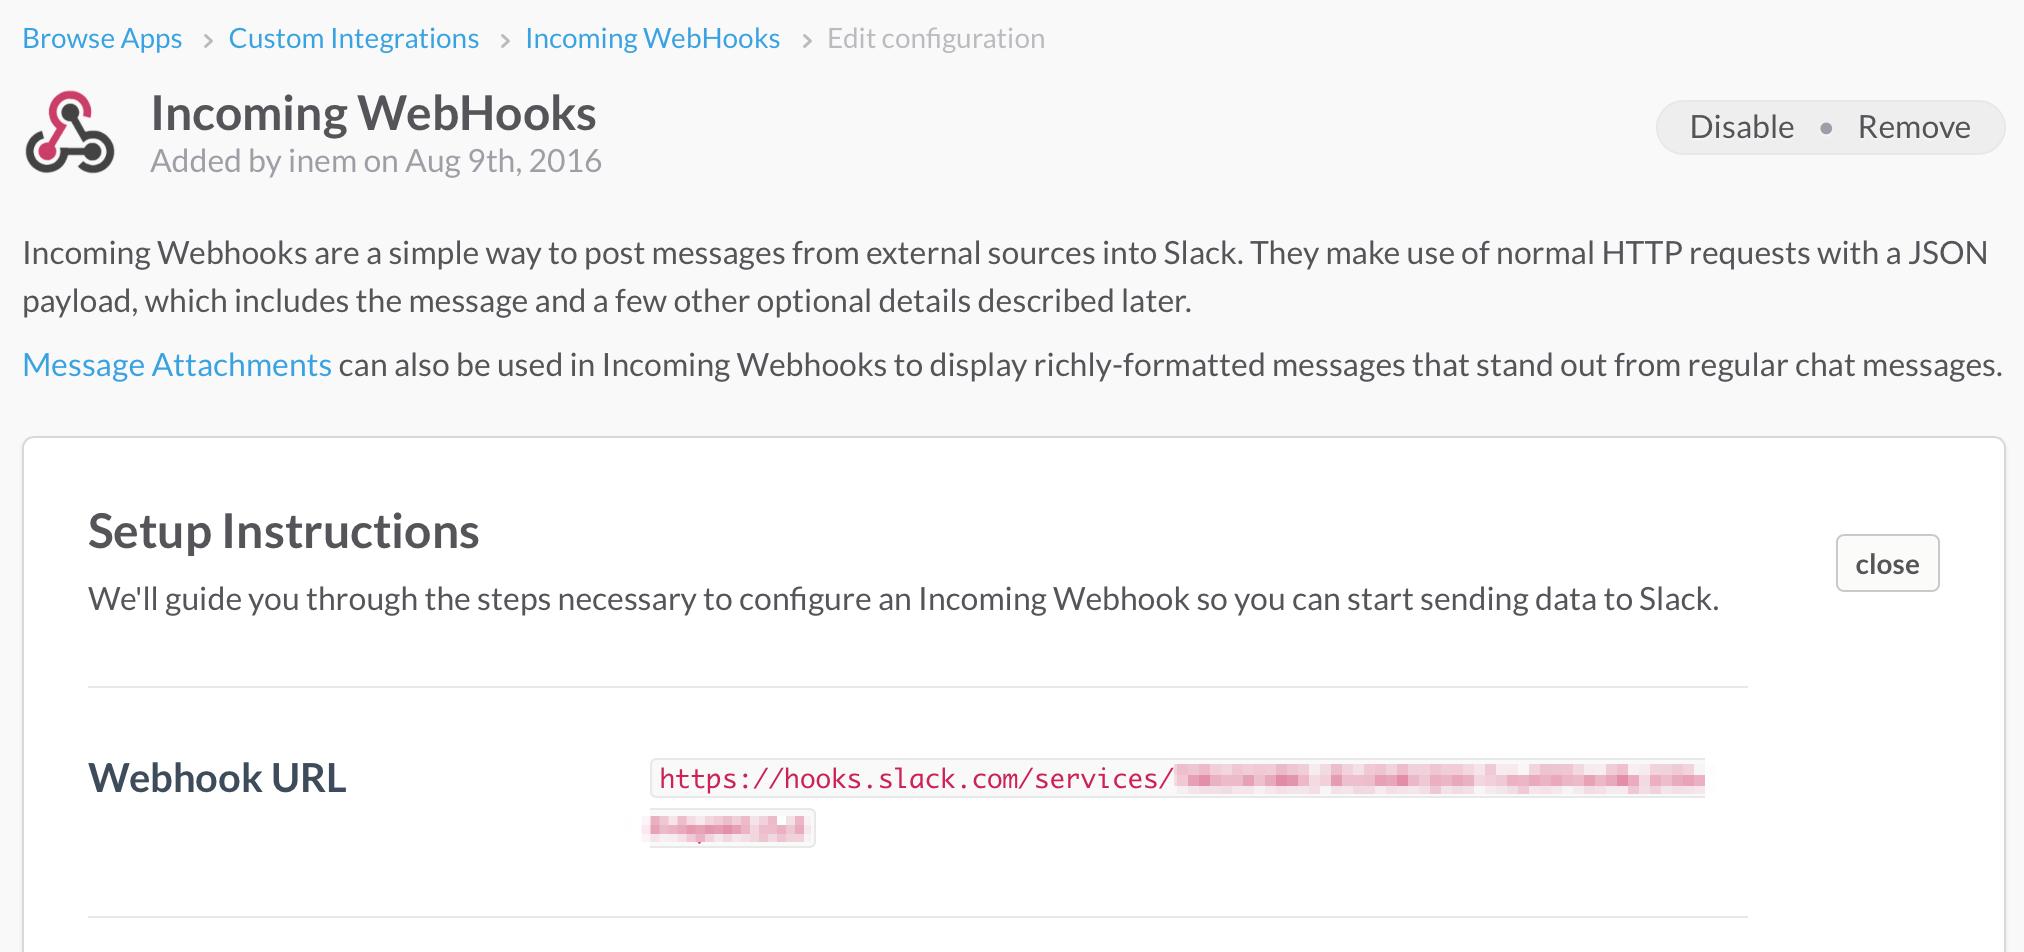 Grabbing Incoming WebHook URL in Slack